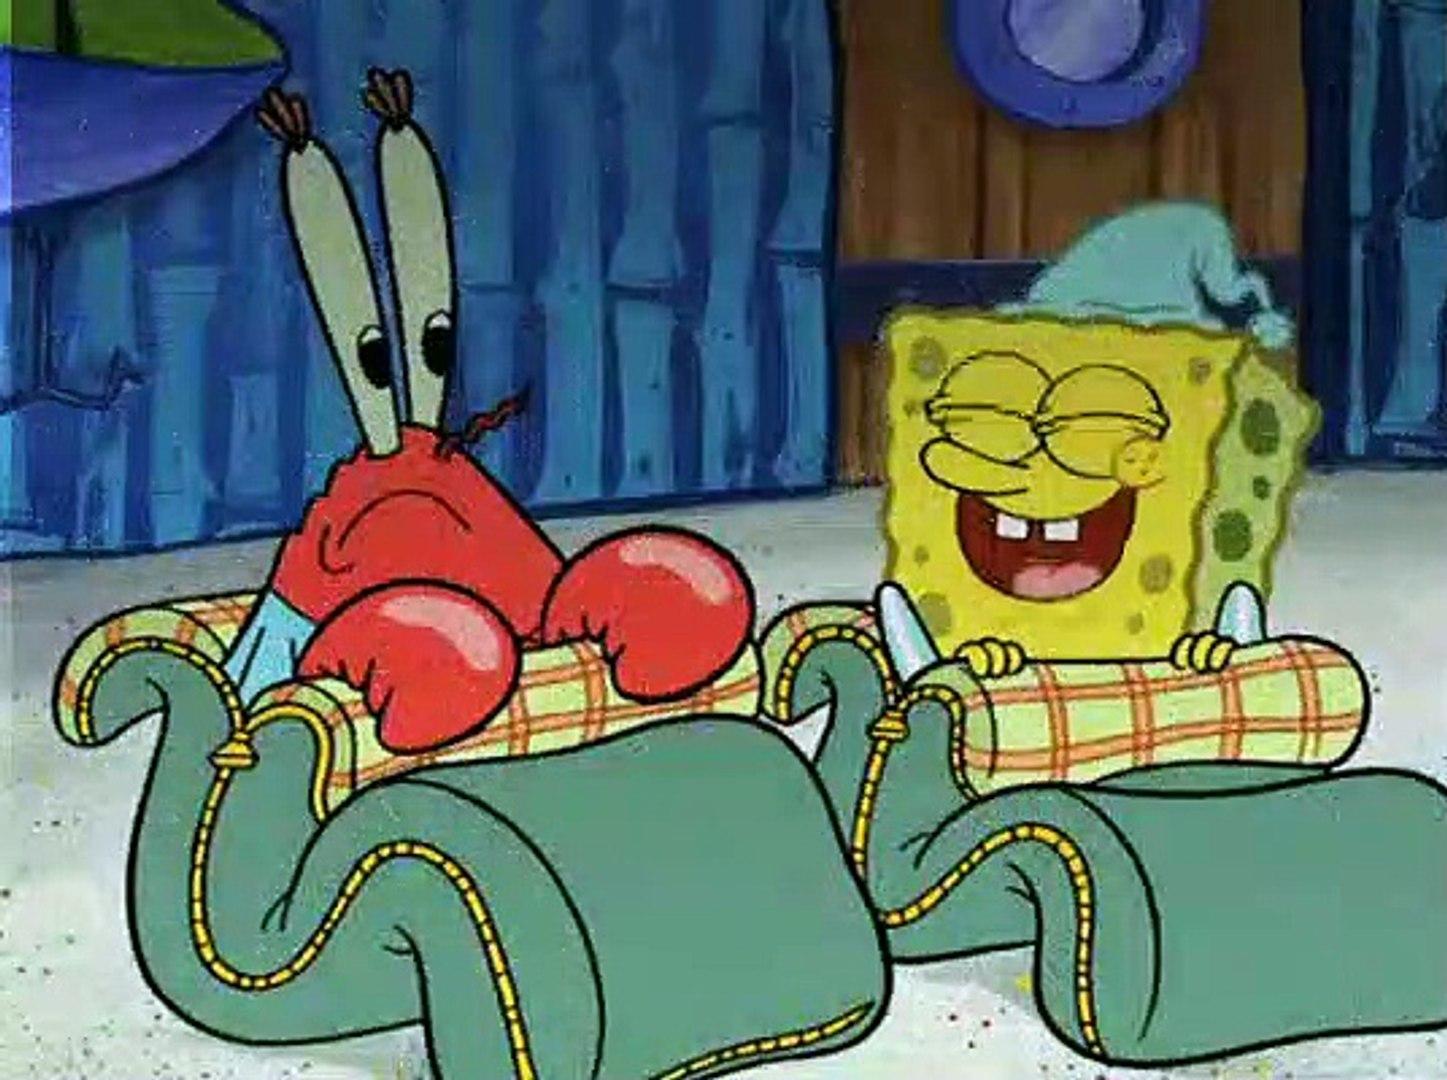 Spongebob Squarepants S06e18 The Slumber Party Video Dailymotion